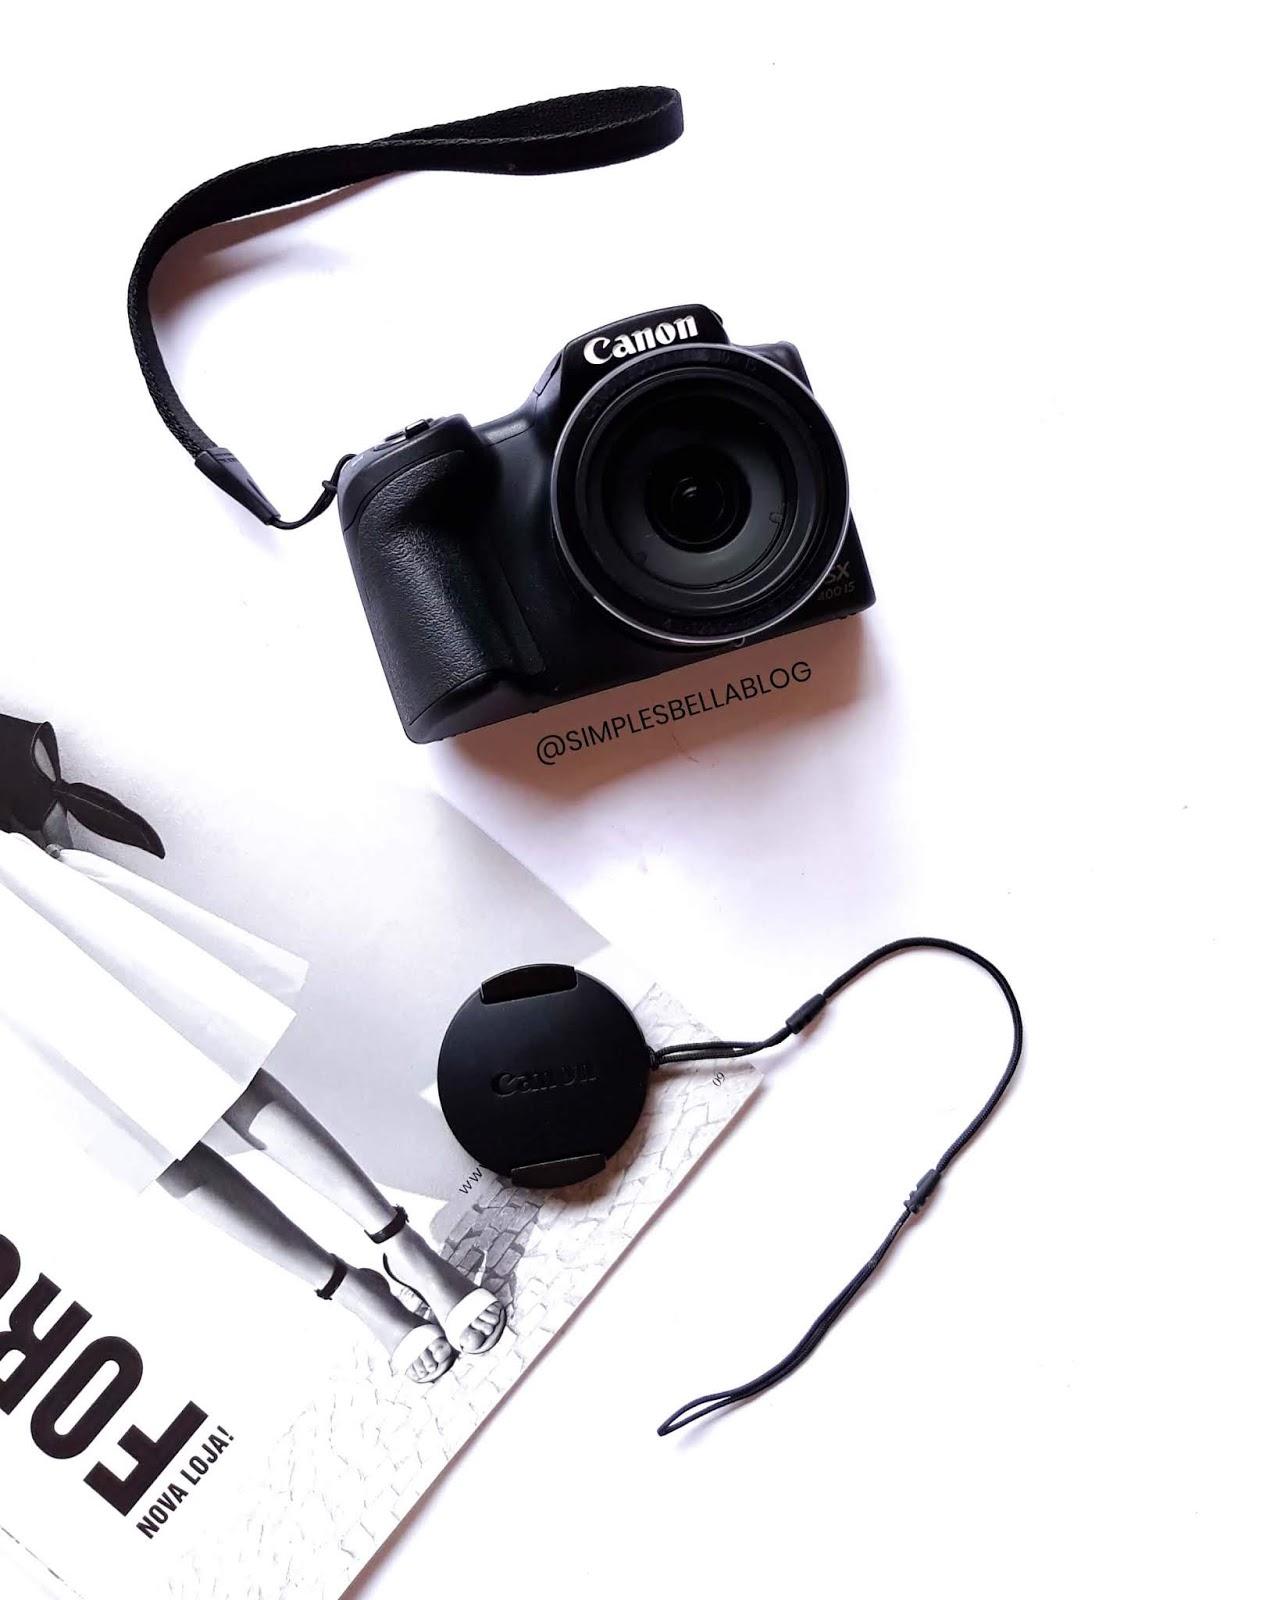 Canon Powershot sx400is - Foto tirada com Samsung J5 PRO